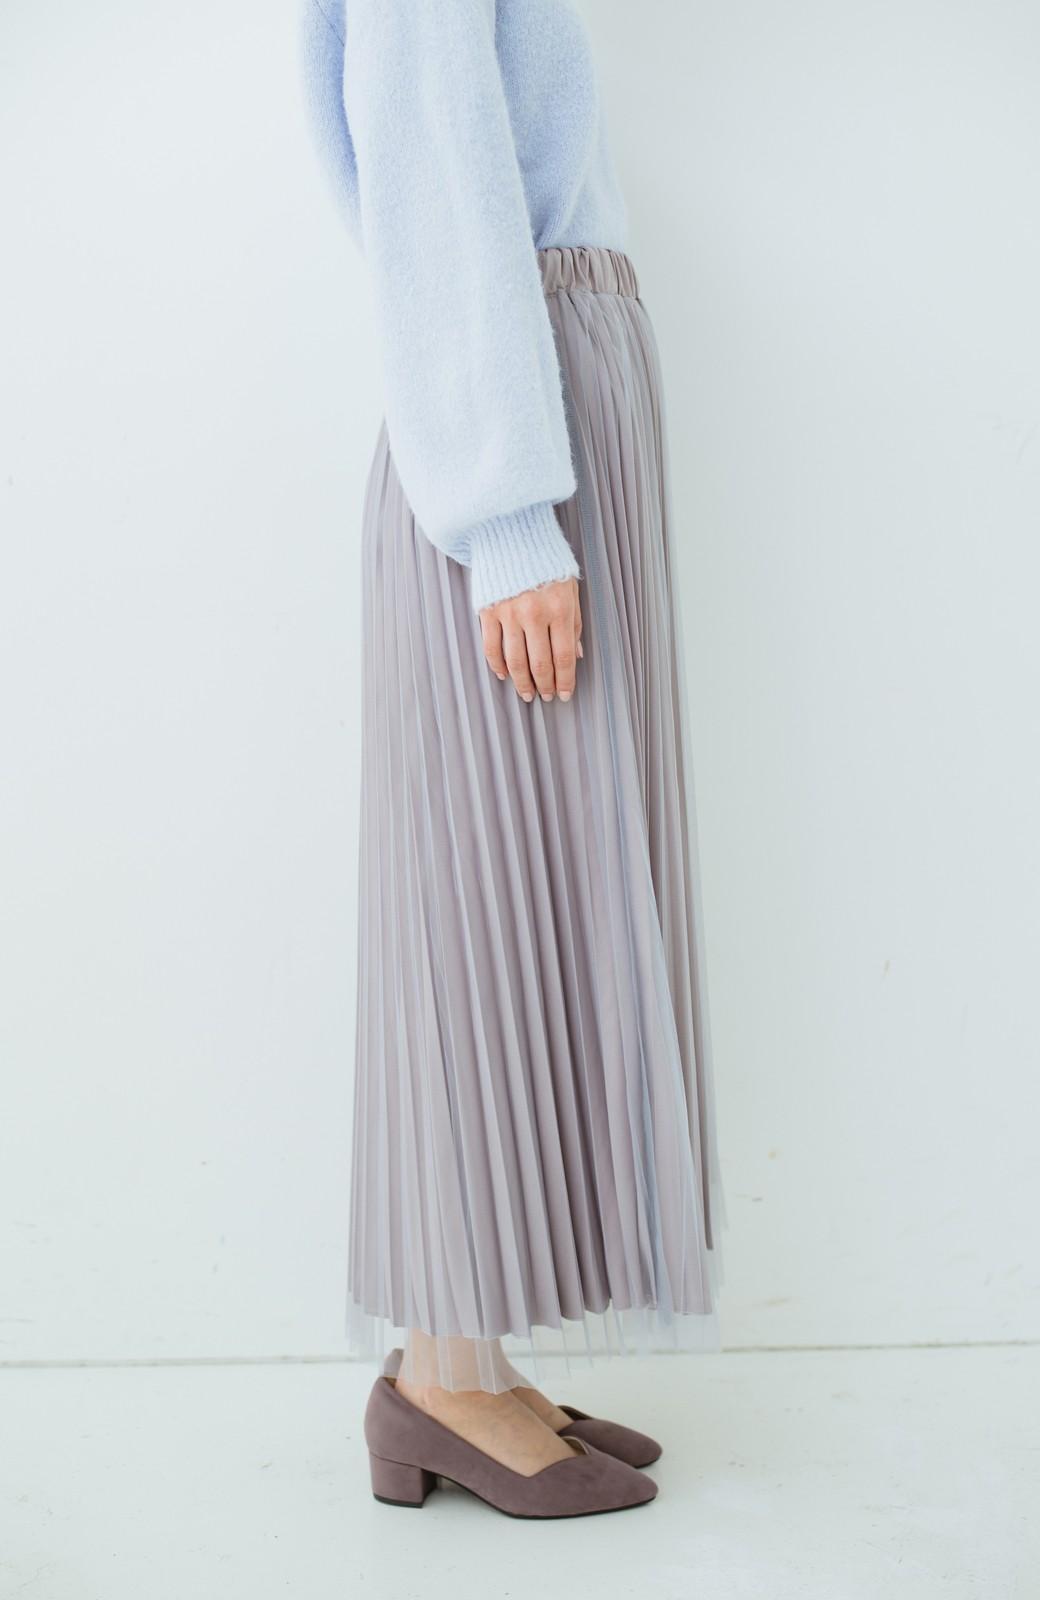 haco! どんな日も華やか気分にしてくれる 二枚仕立てのチュールプリーツスカート <ライトグレー>の商品写真5